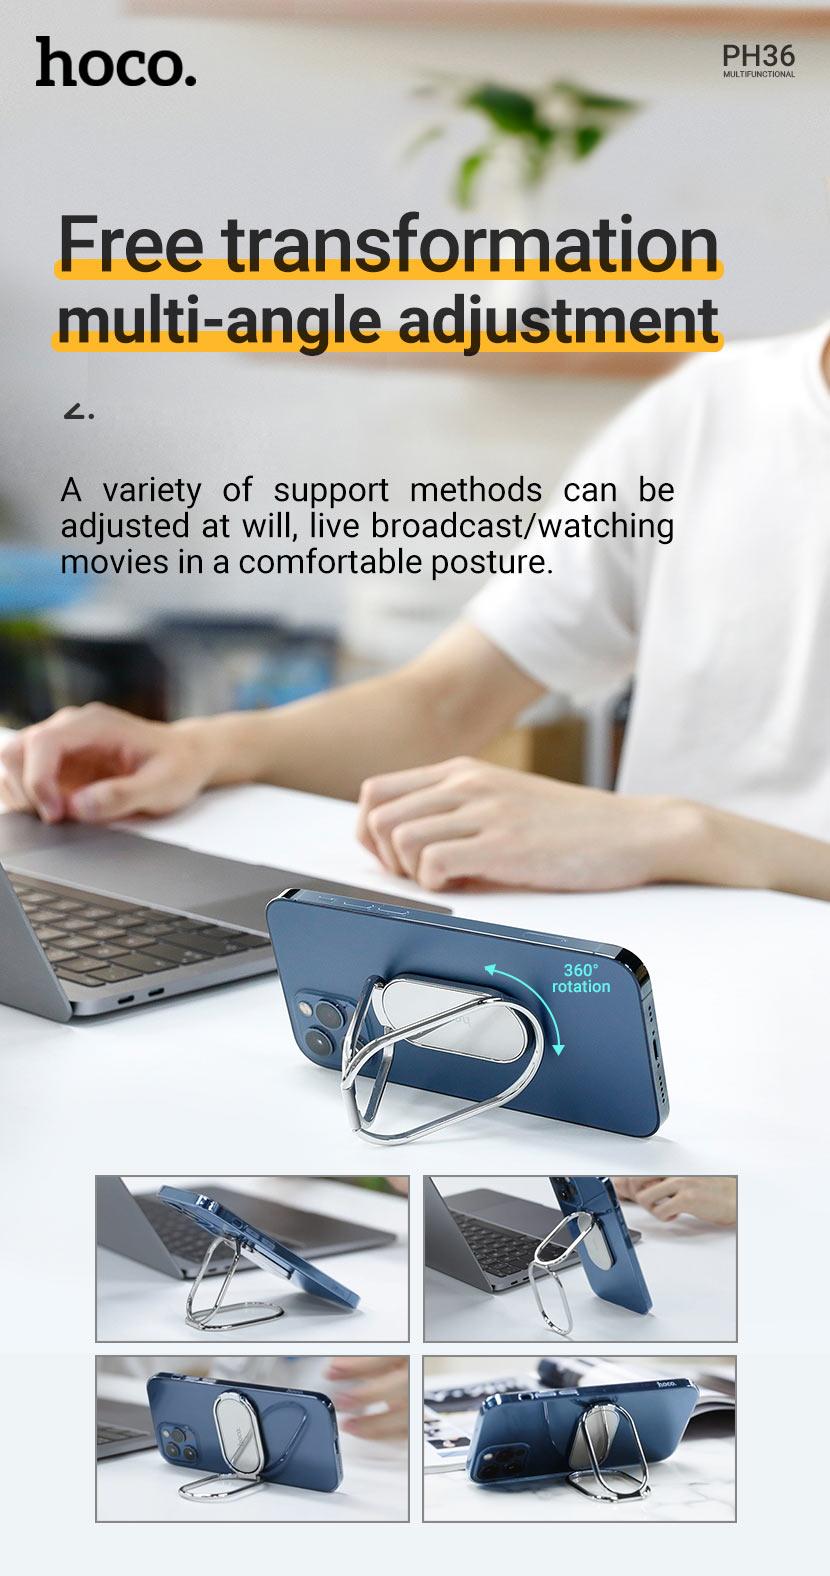 hoco news ph36 emma metal multifunctional folding stand transformation en